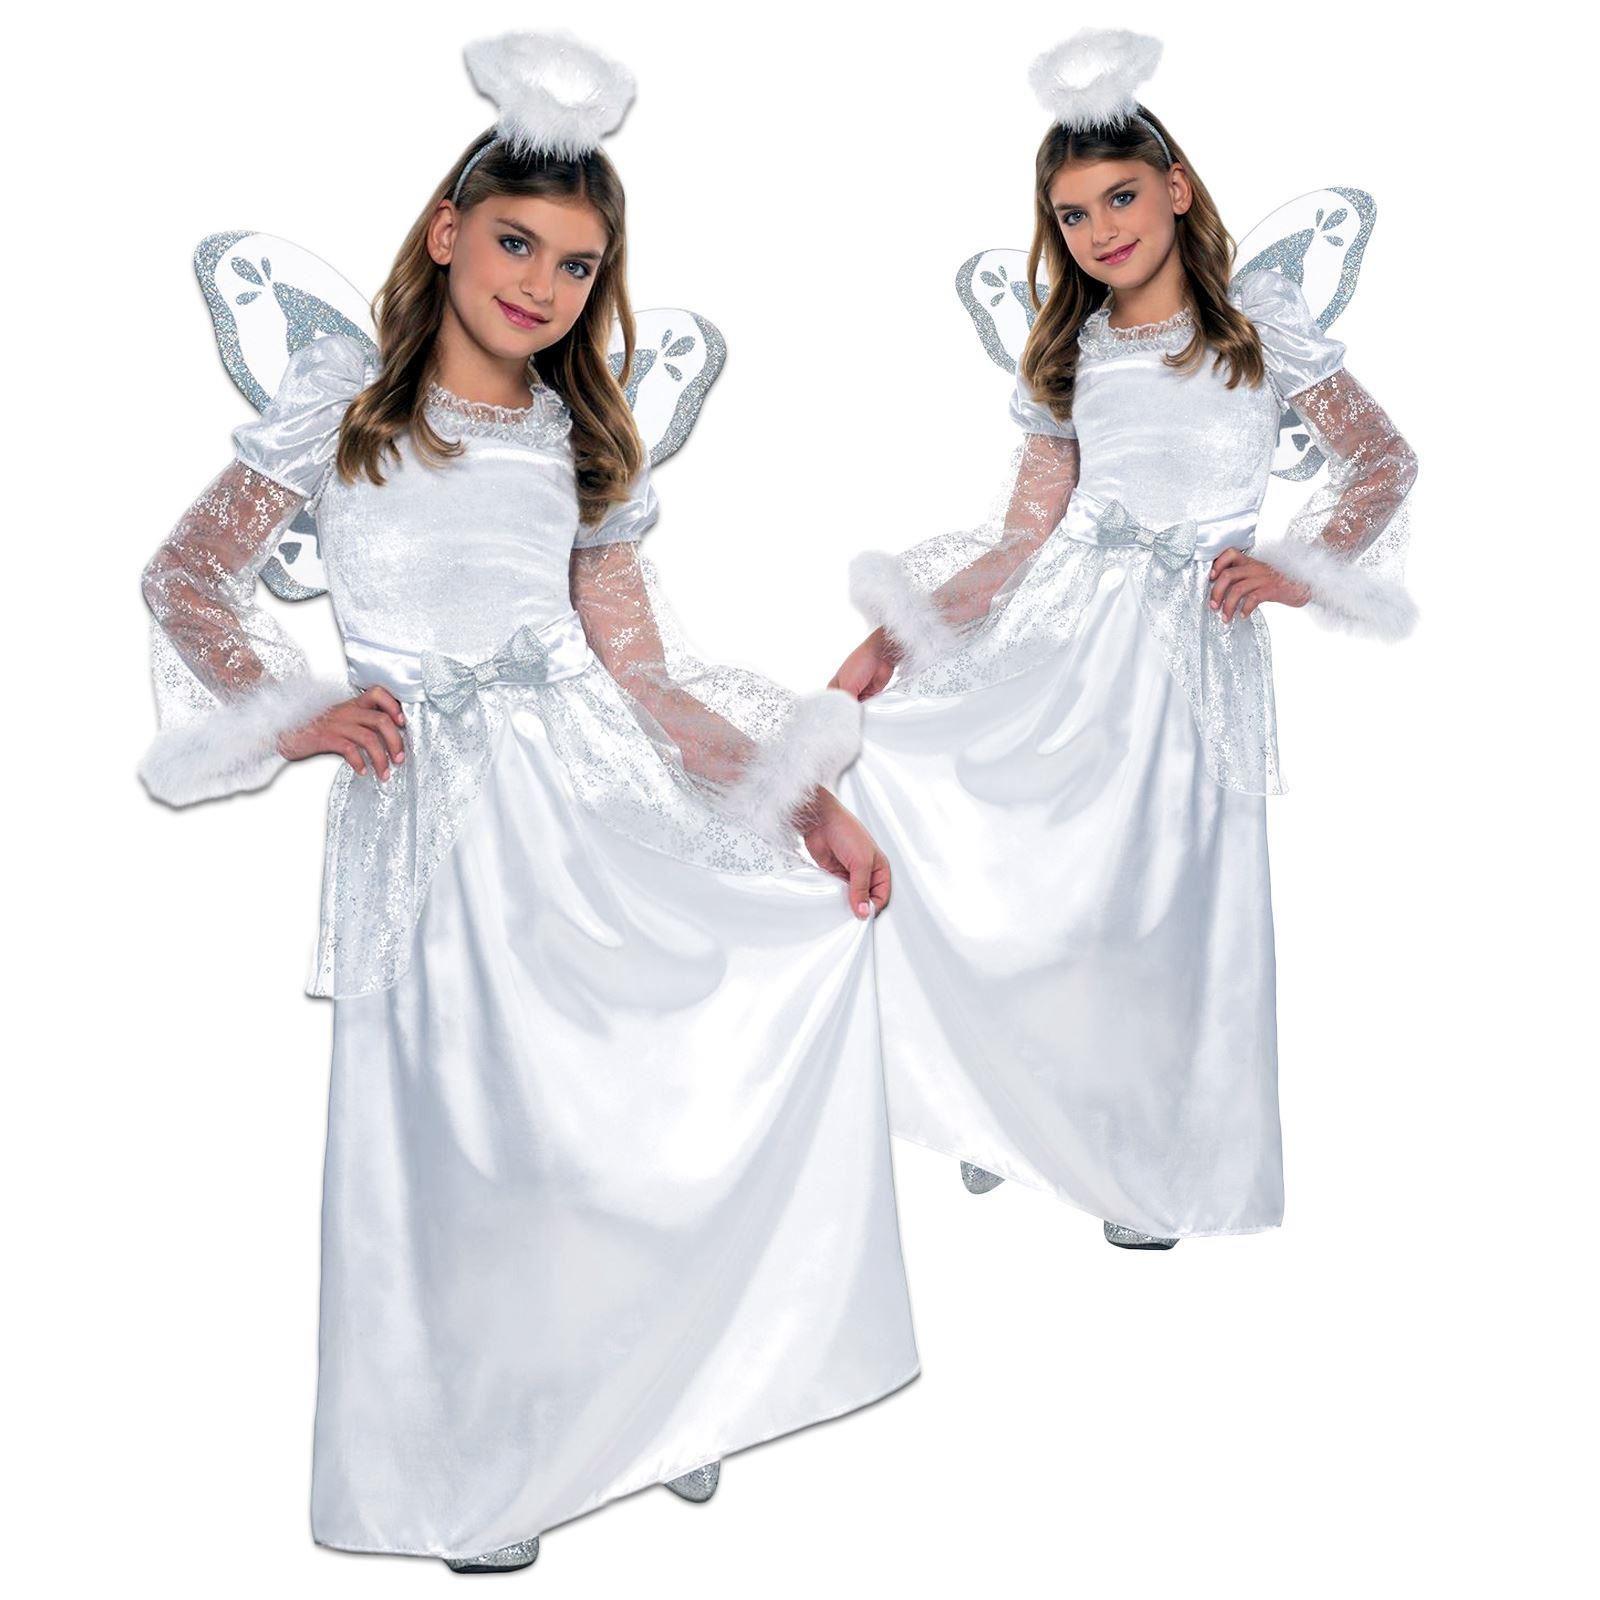 Boys-Girls-Angel-Christmas-School-Play-Nativity-Fancy-  sc 1 st  eBay & Boys Girls Angel Christmas School Play Nativity Fancy Dress Outfit ...